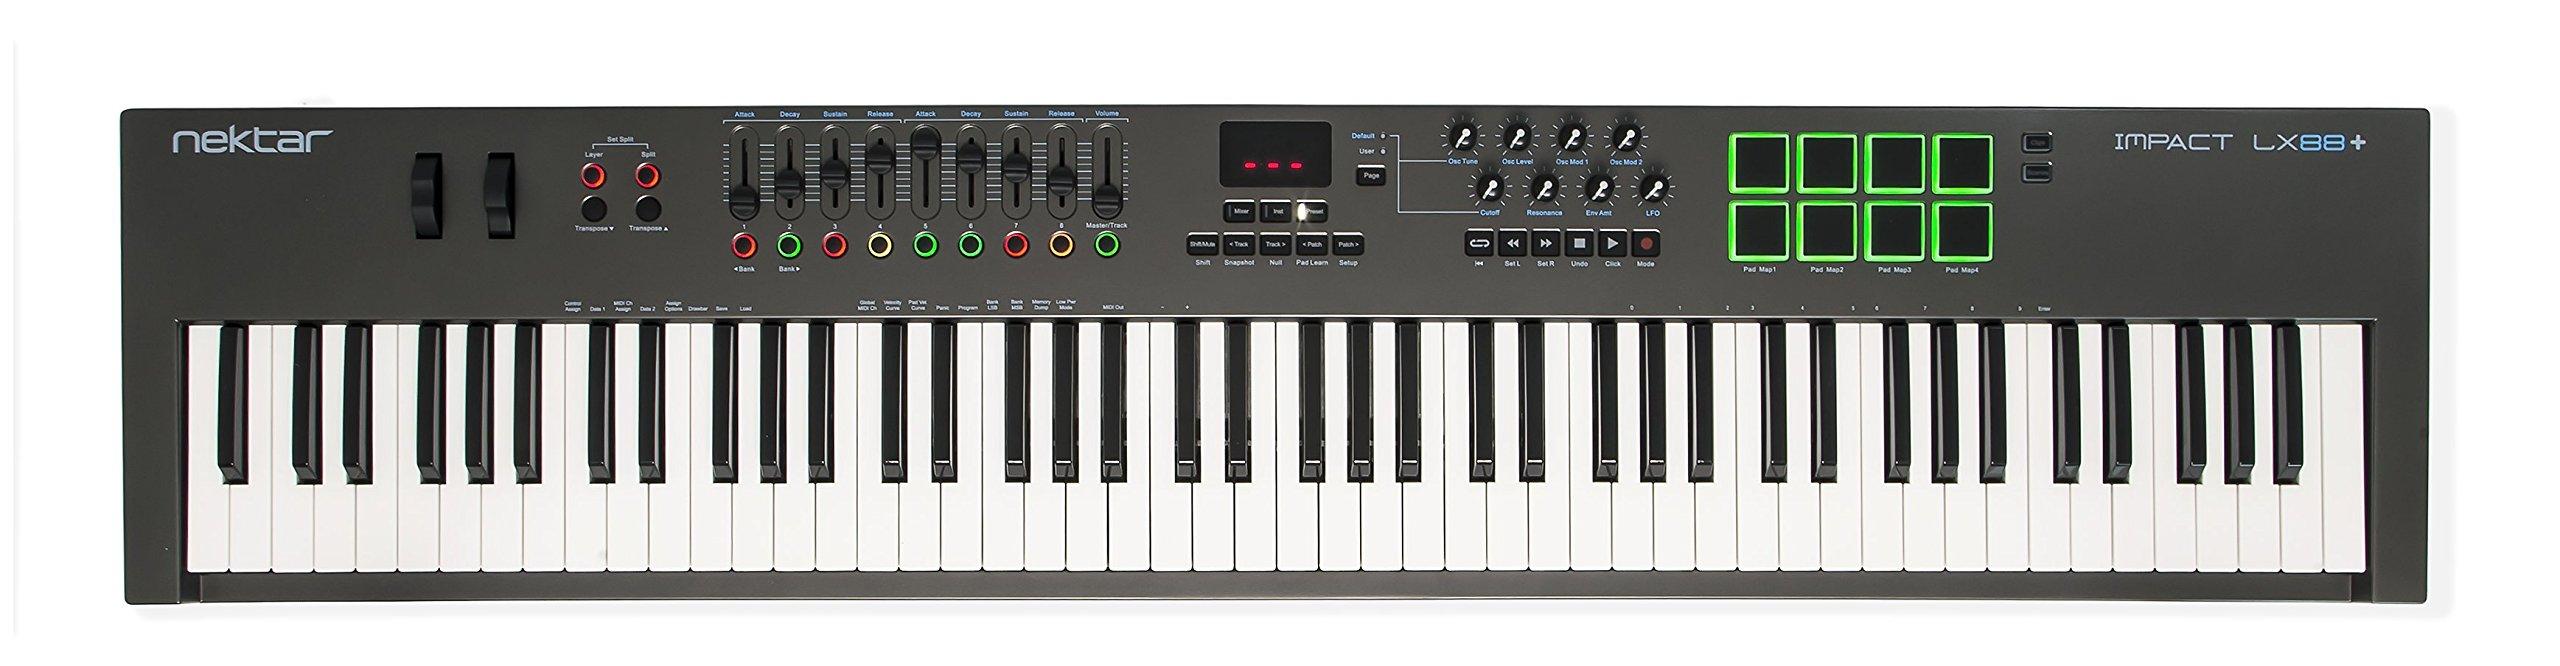 Nektar (IMPACT LX88+) - Best 88-Key MIDI Controller